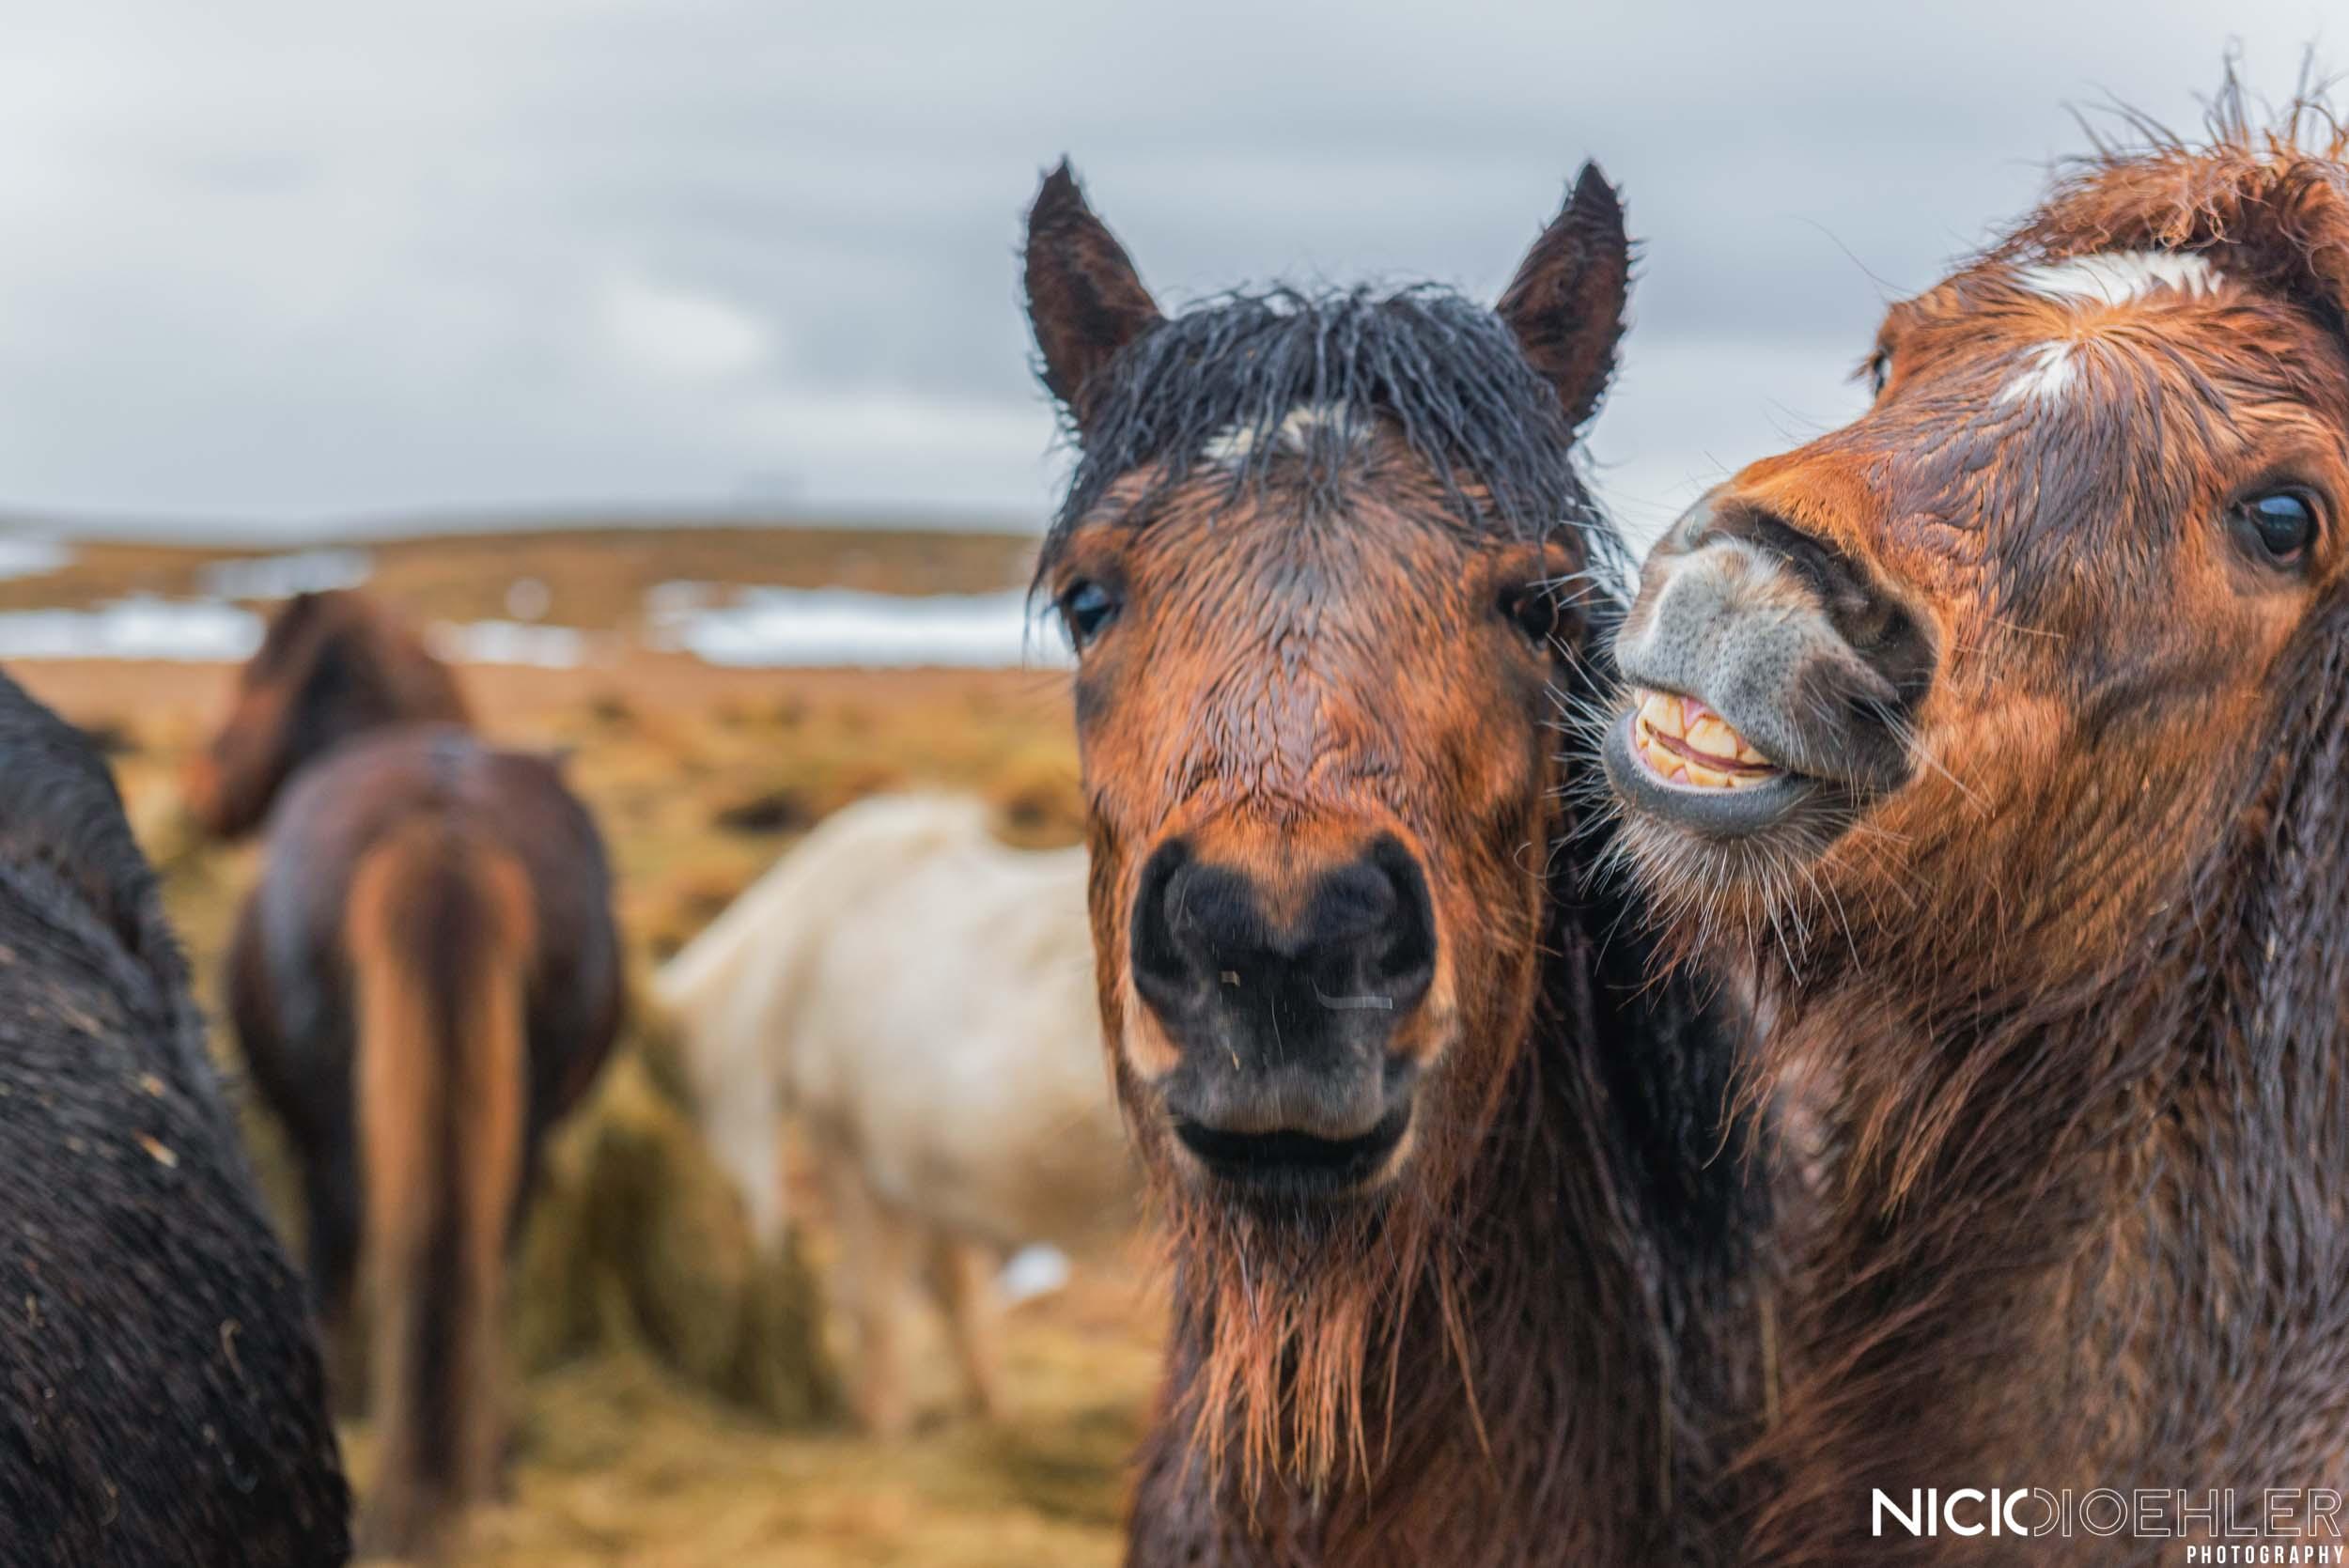 Horse photo-bomb